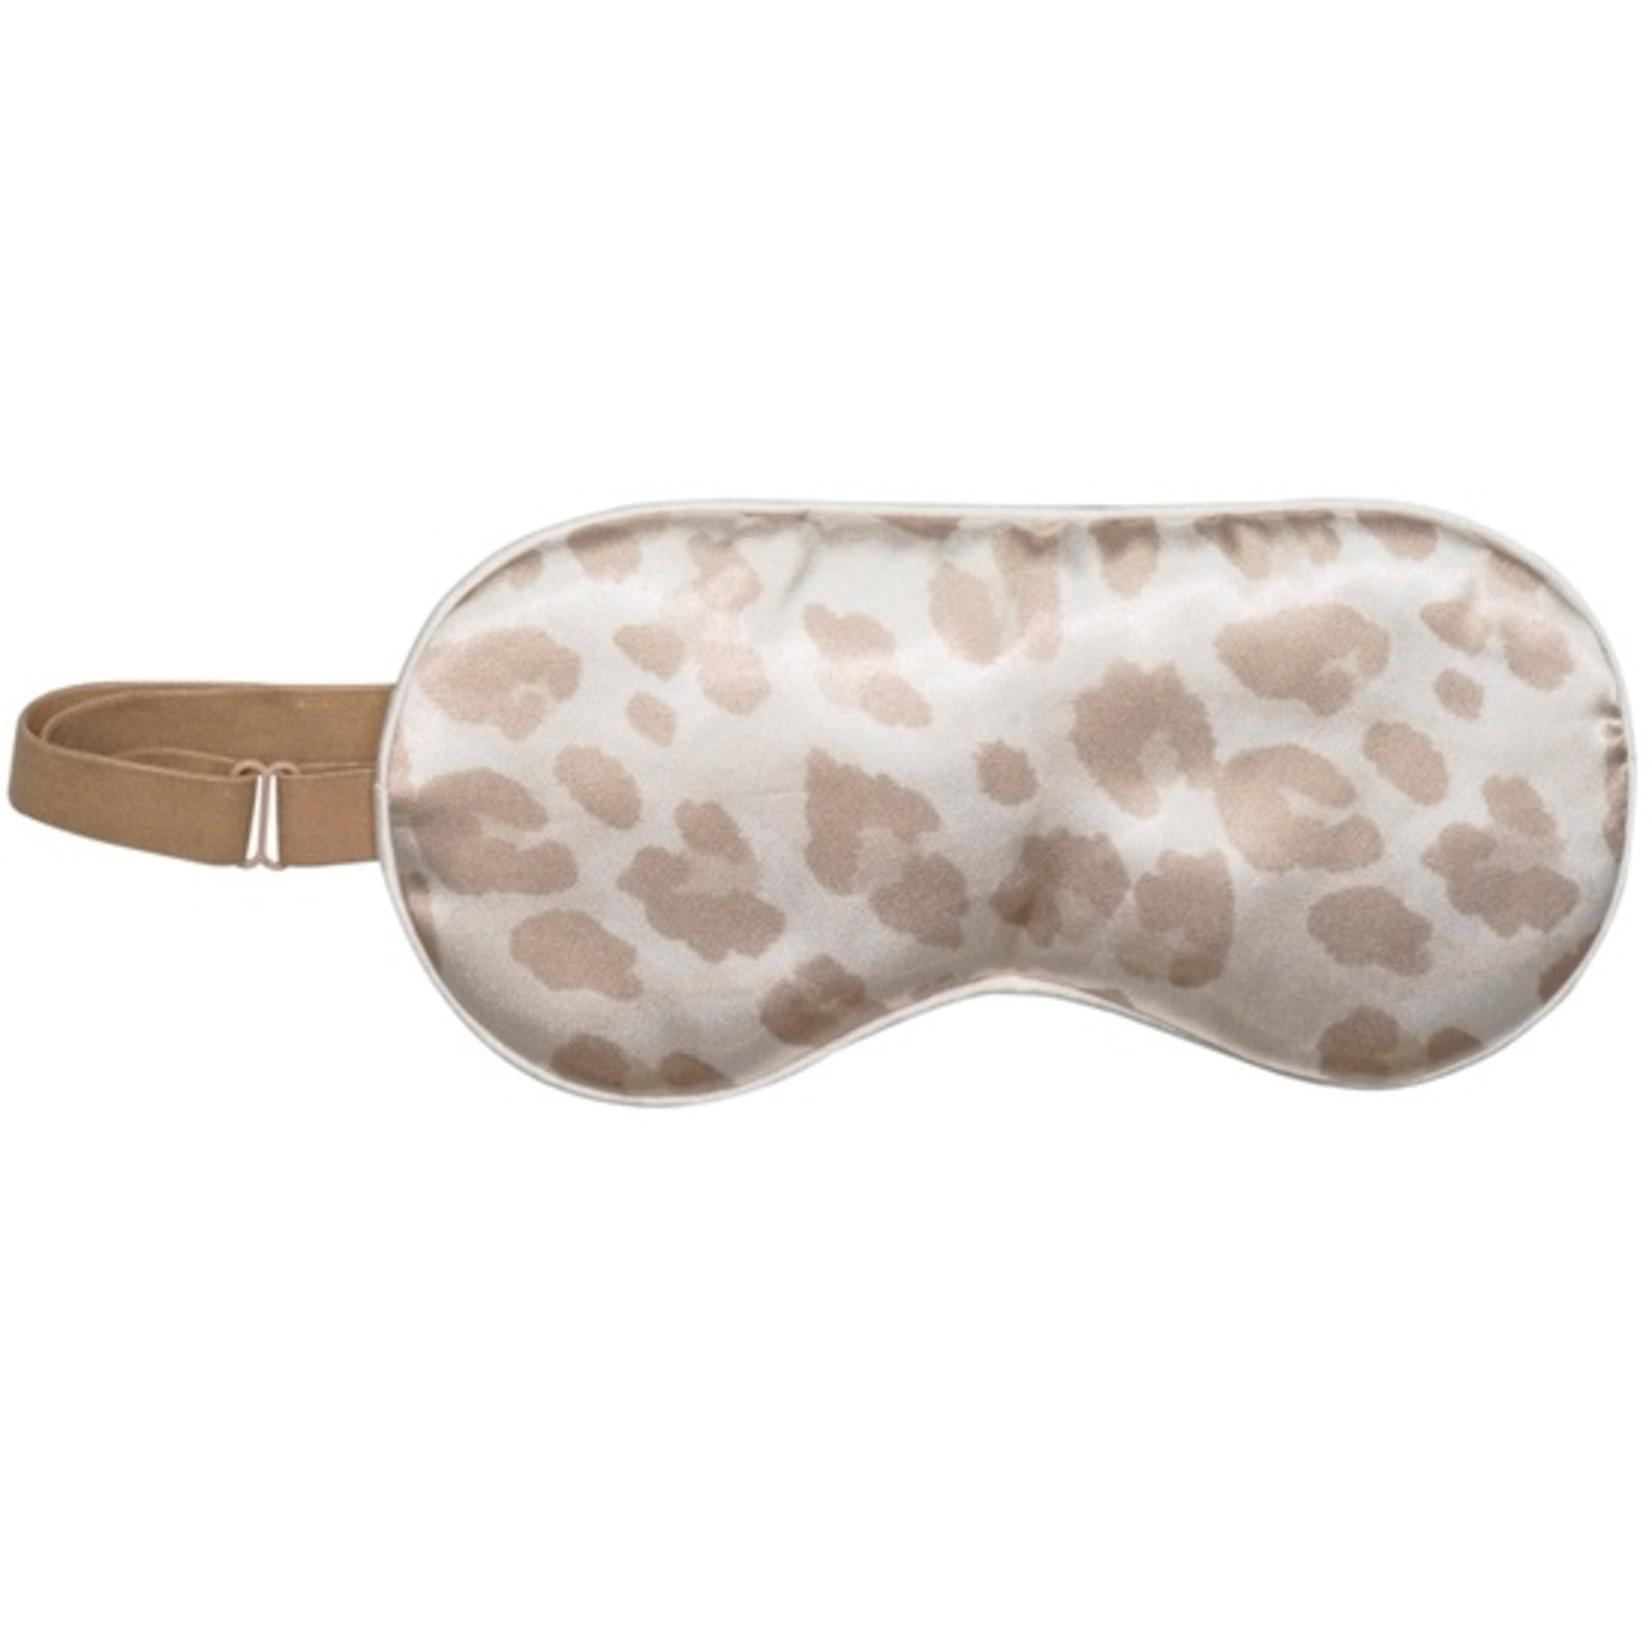 Kitsch Satin Eye Mask in Leopard